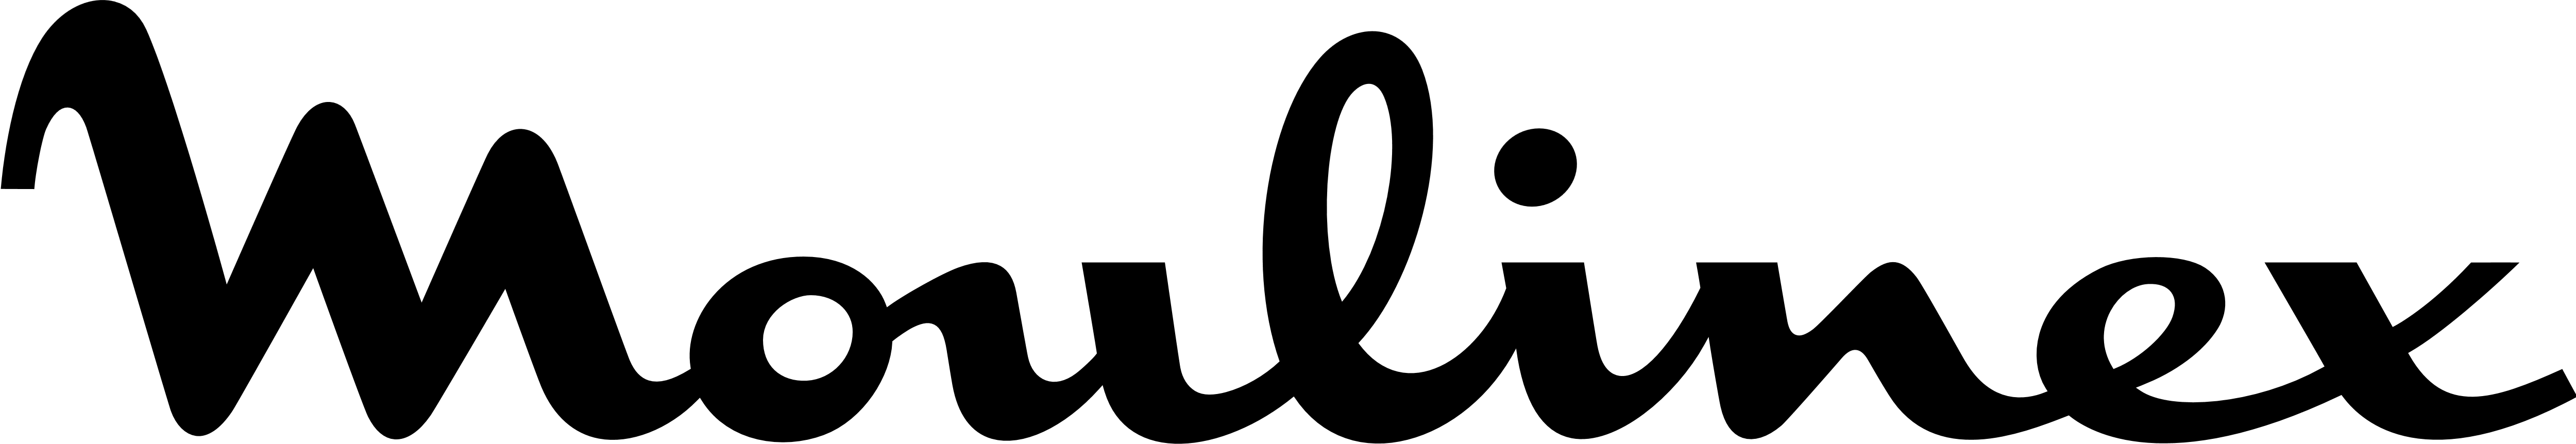 Zte Logo Png Moulinex – Logos Dow...